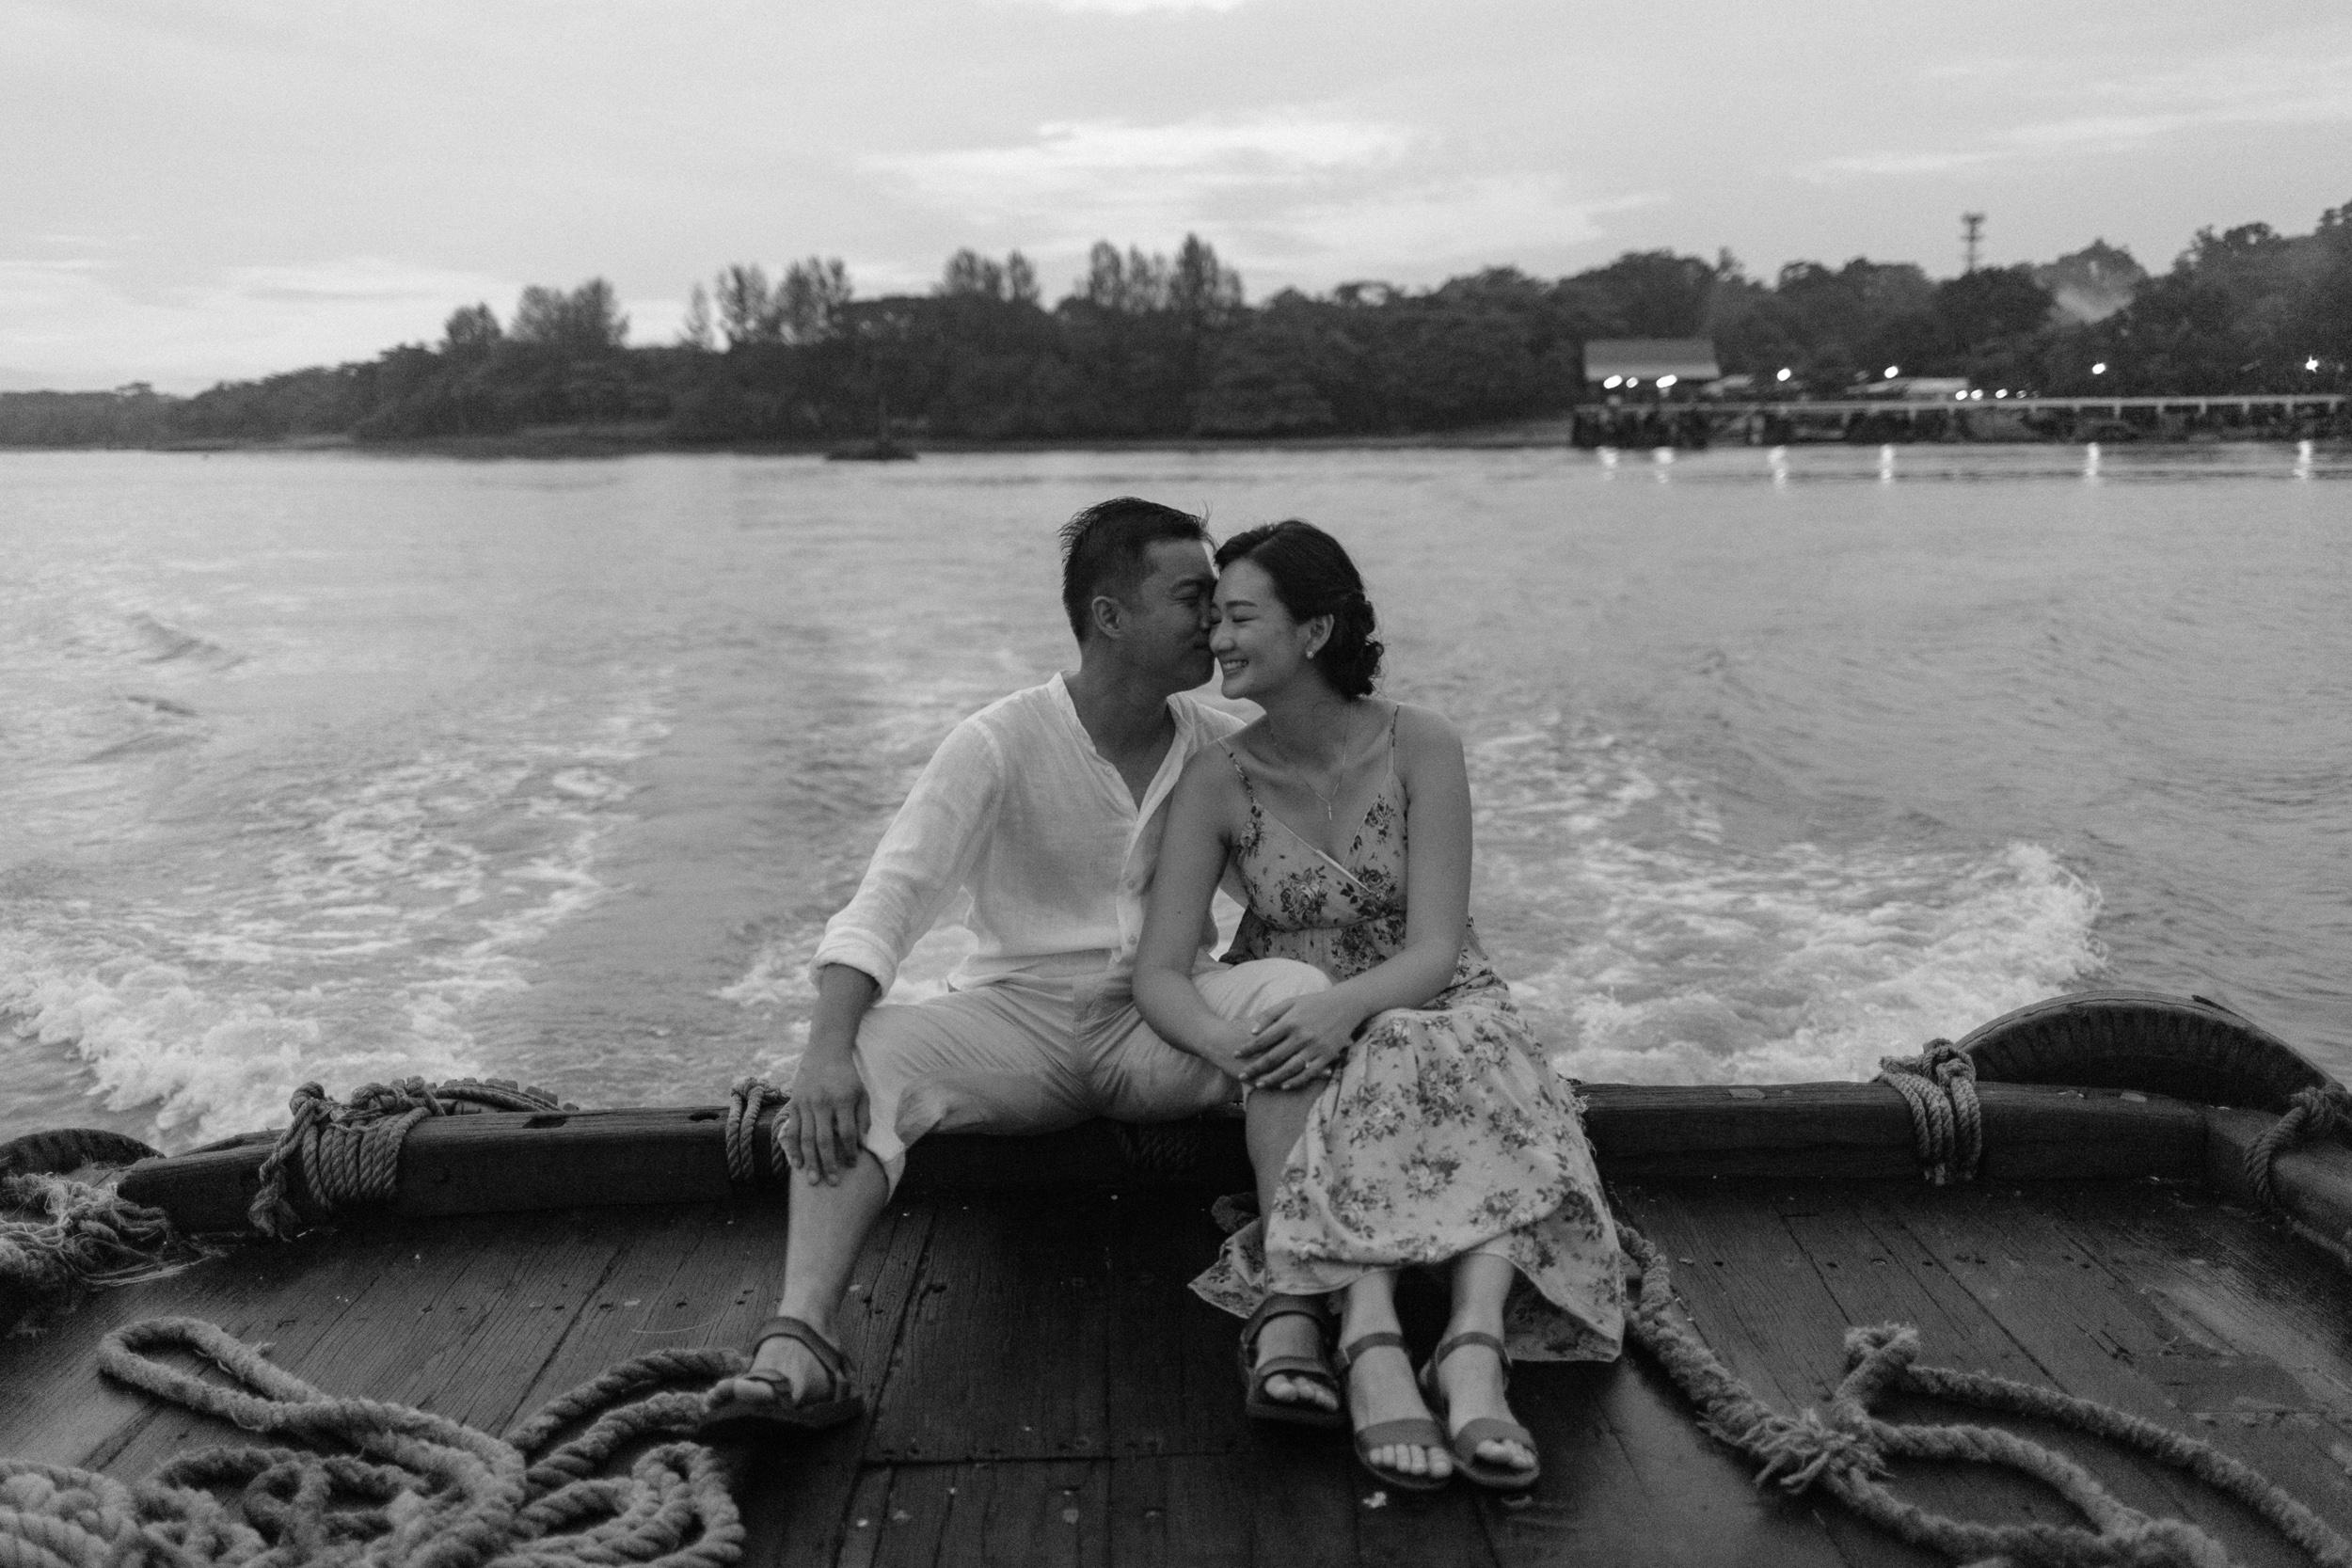 singapore-wedding-photographer-wemadethese-junekit-kingslin-26.jpg